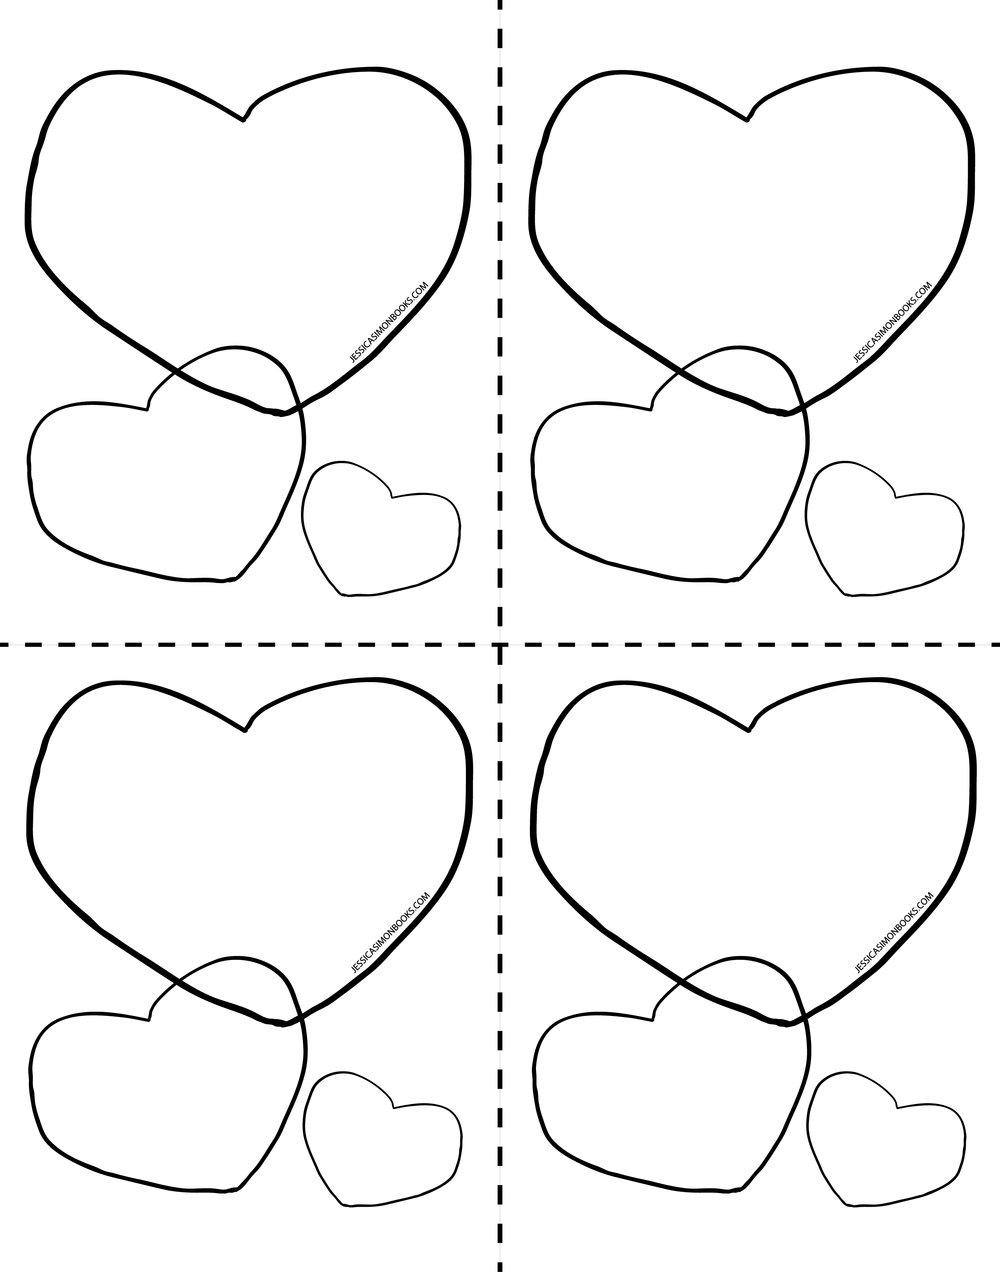 Heart Print Out.jpg